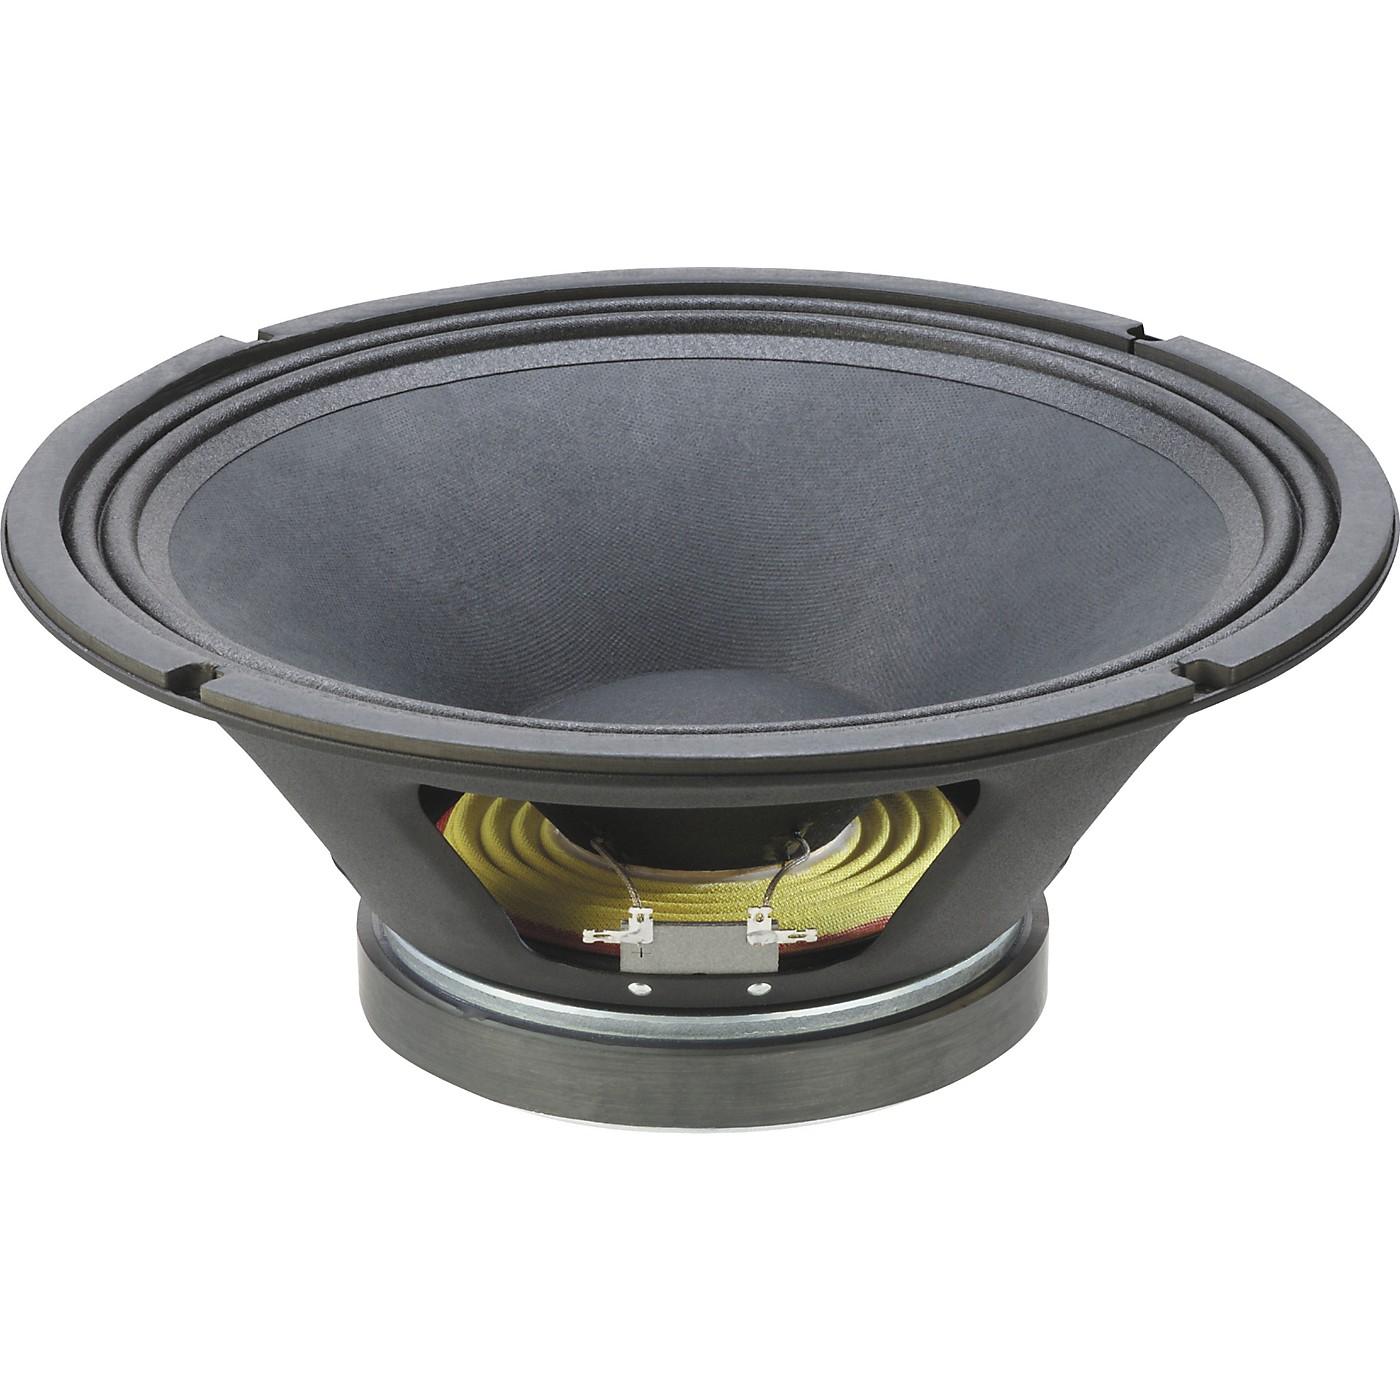 Celestion TF 1225 PA Speaker: Woofer 8 ohm thumbnail